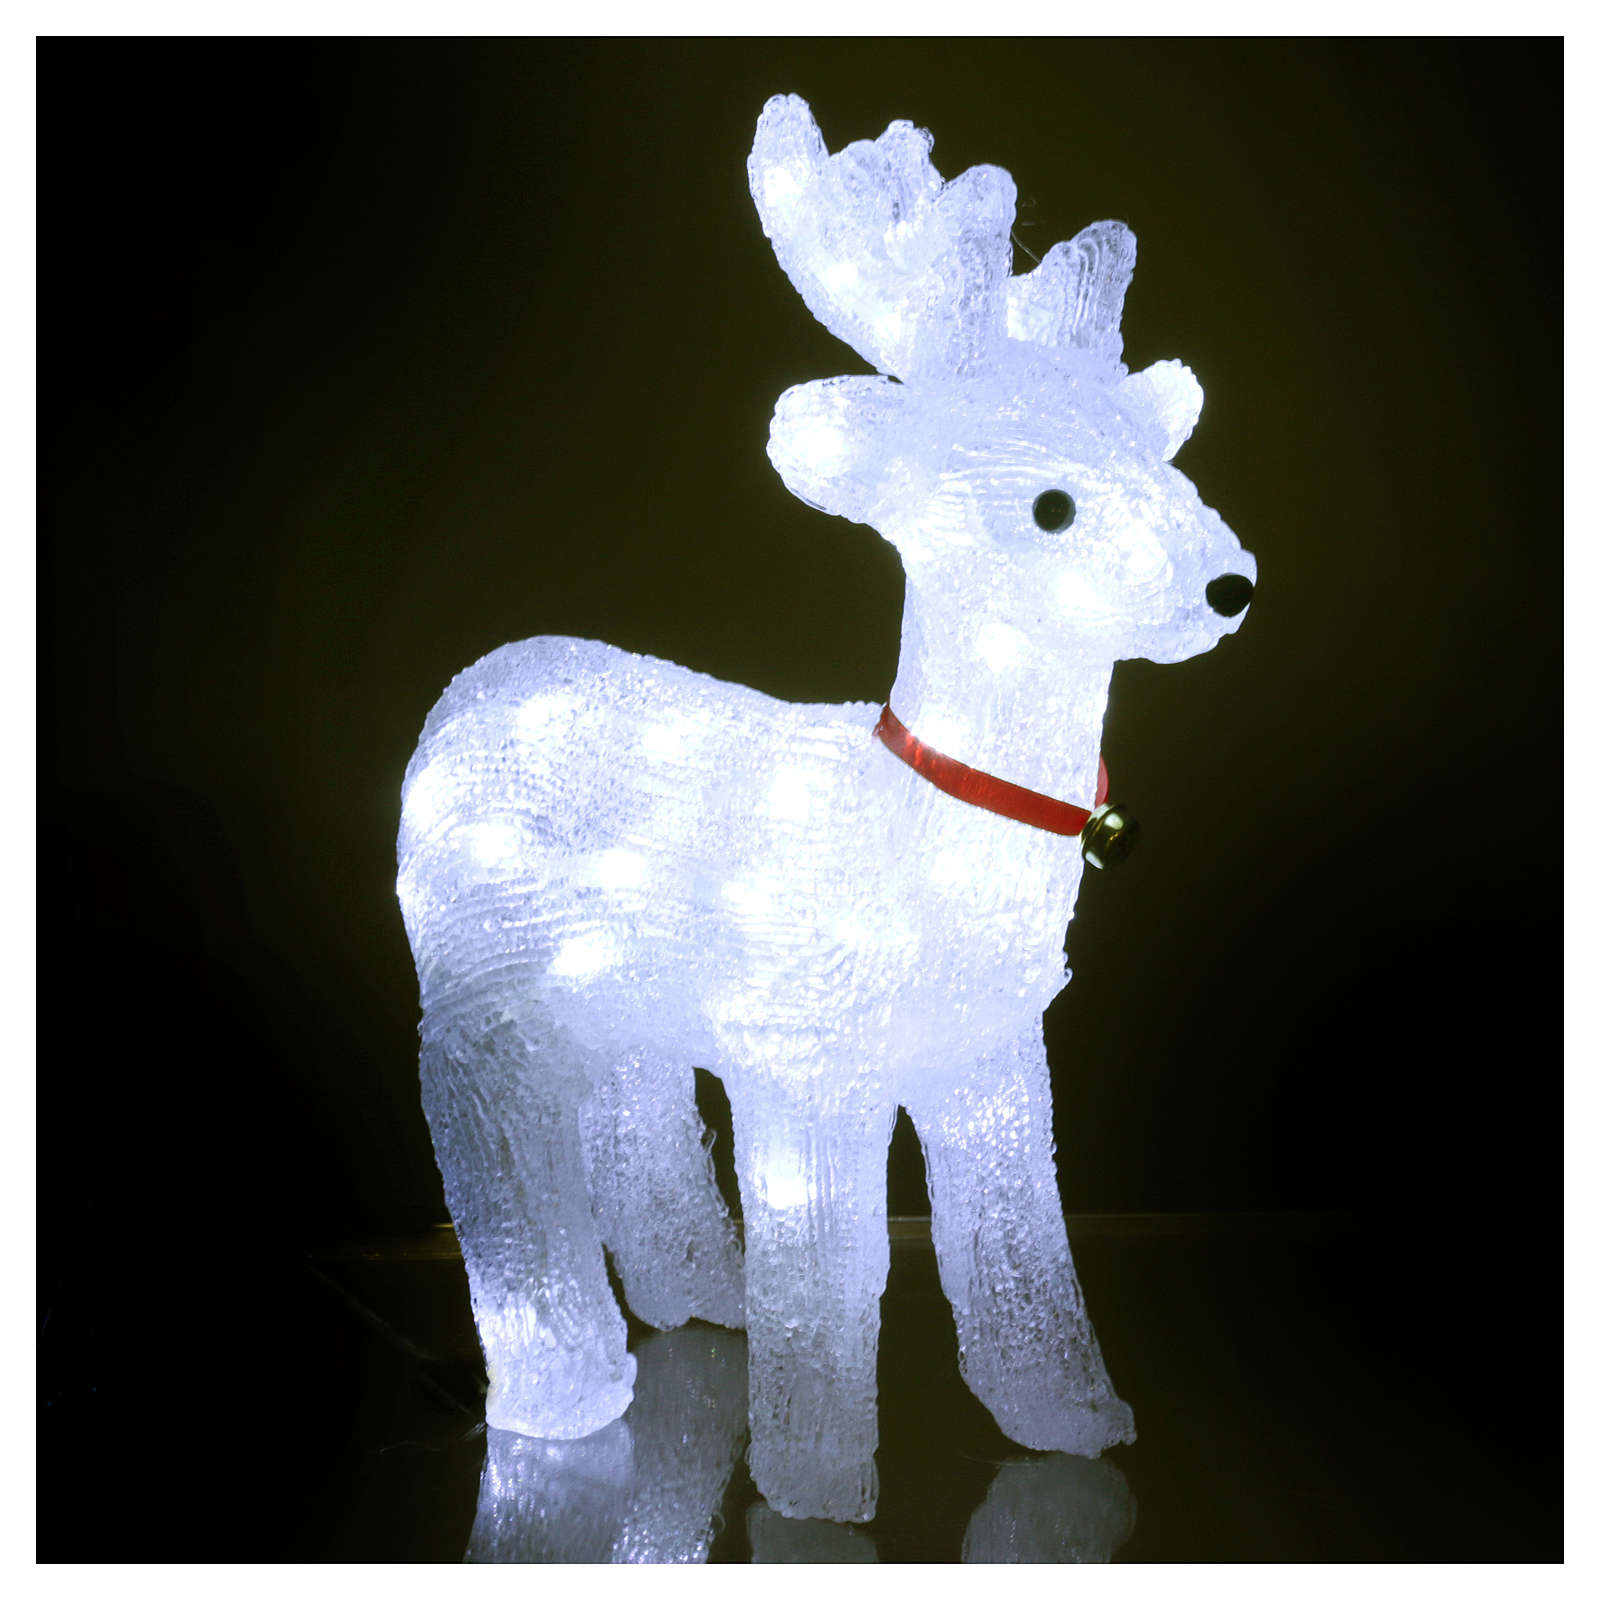 Reindeer light 40 leds 37 cm ice white internal and external use 3